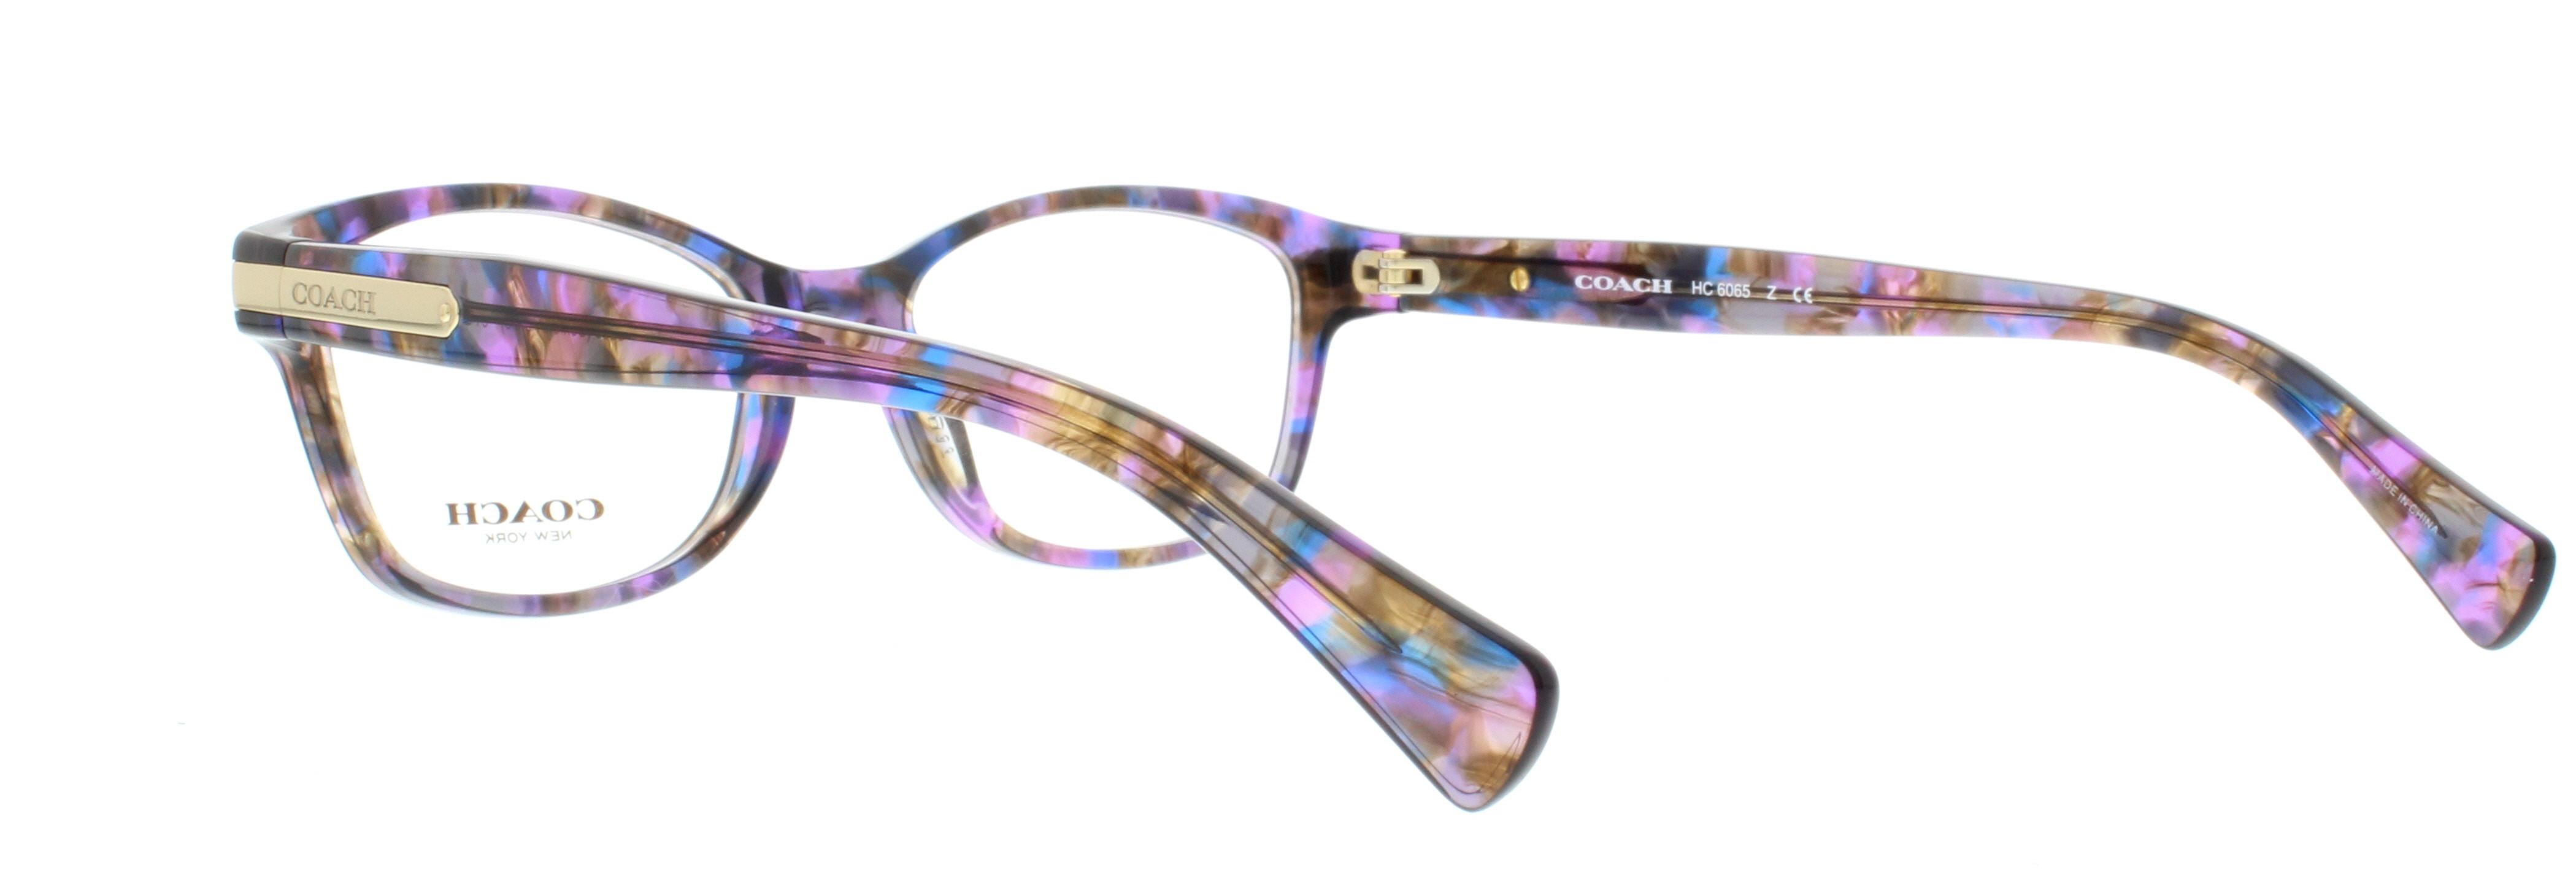 f0c1bc621cd Coach eyeglasses confetti purple ebay jpg 4199x1423 Confetti purple coach  suns